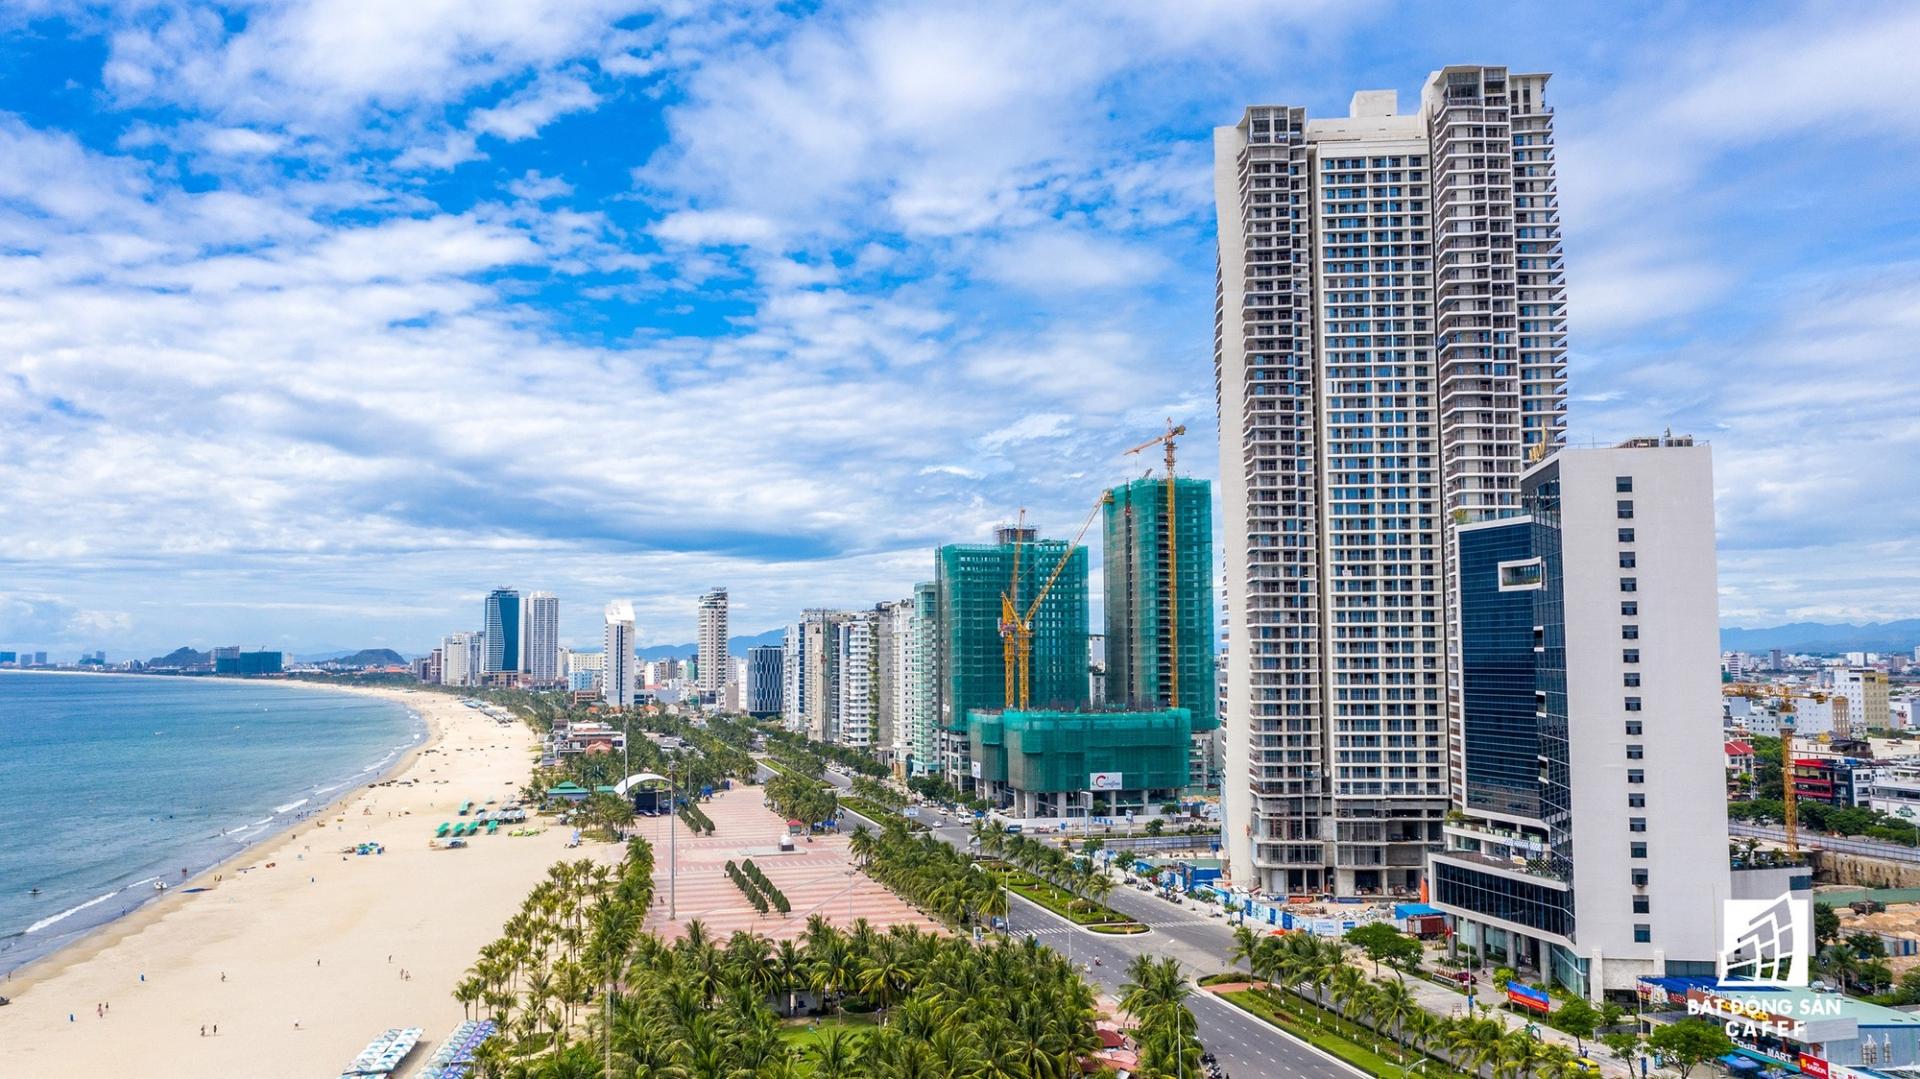 Vietnam's coastal real estate market woos investors